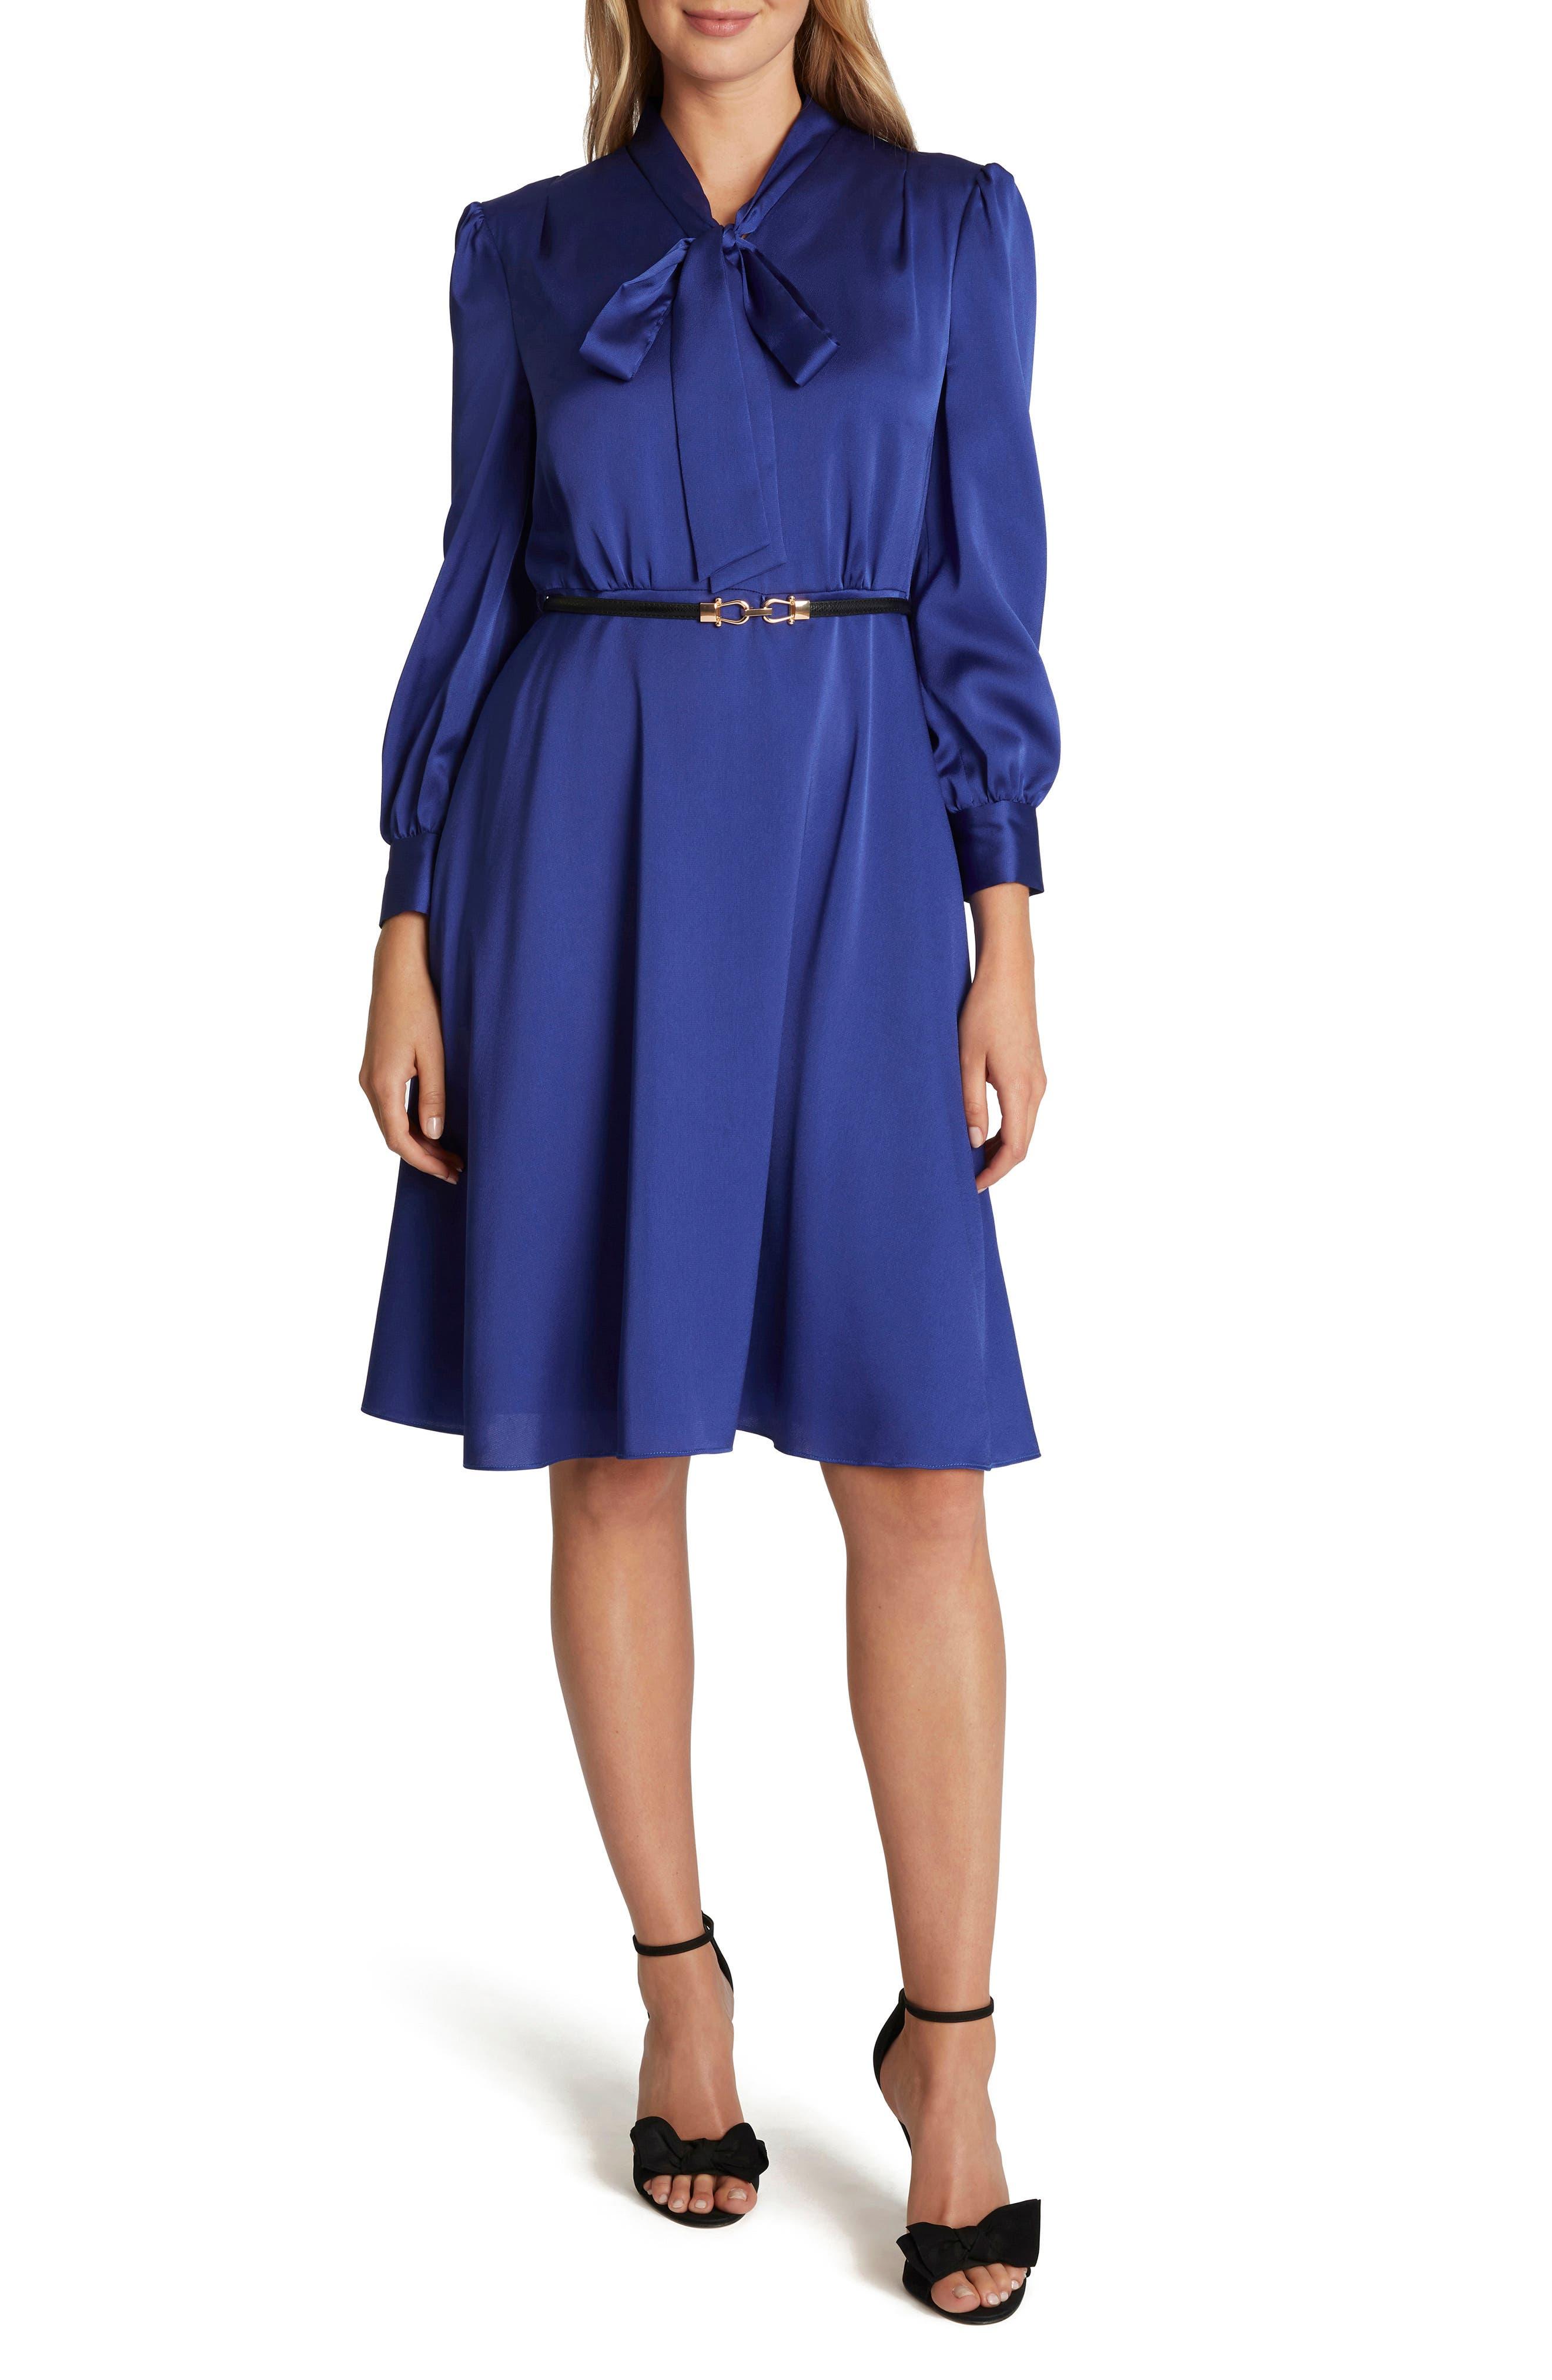 10+ Websites with 1940s Dresses for Sale Womens Tahari Tie Neck Long Sleeve Chiffon Dress $148.00 AT vintagedancer.com